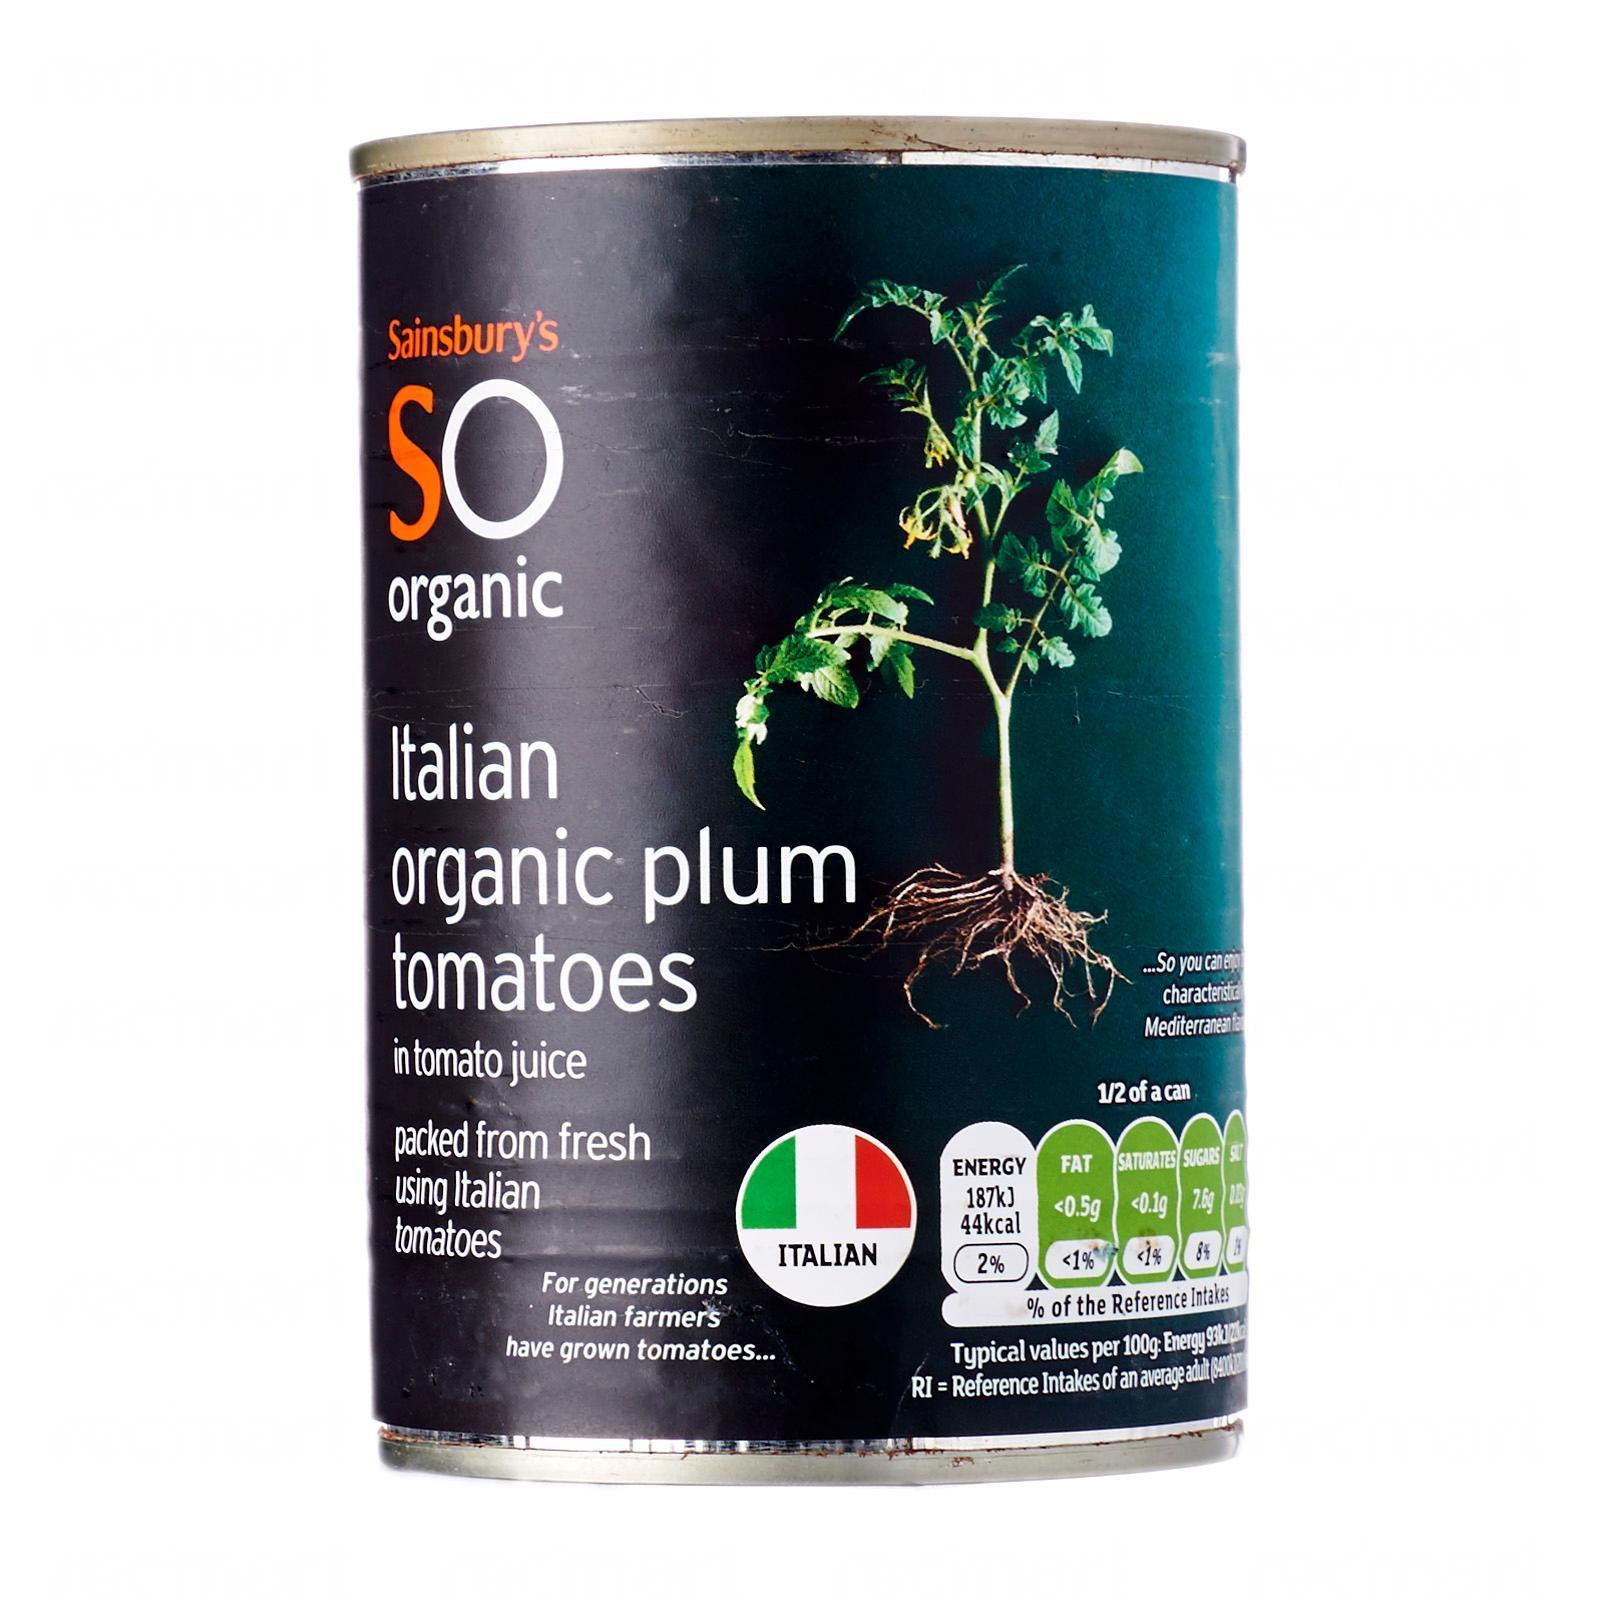 Sainsbury's Organic Peeled Plum Tomatoes